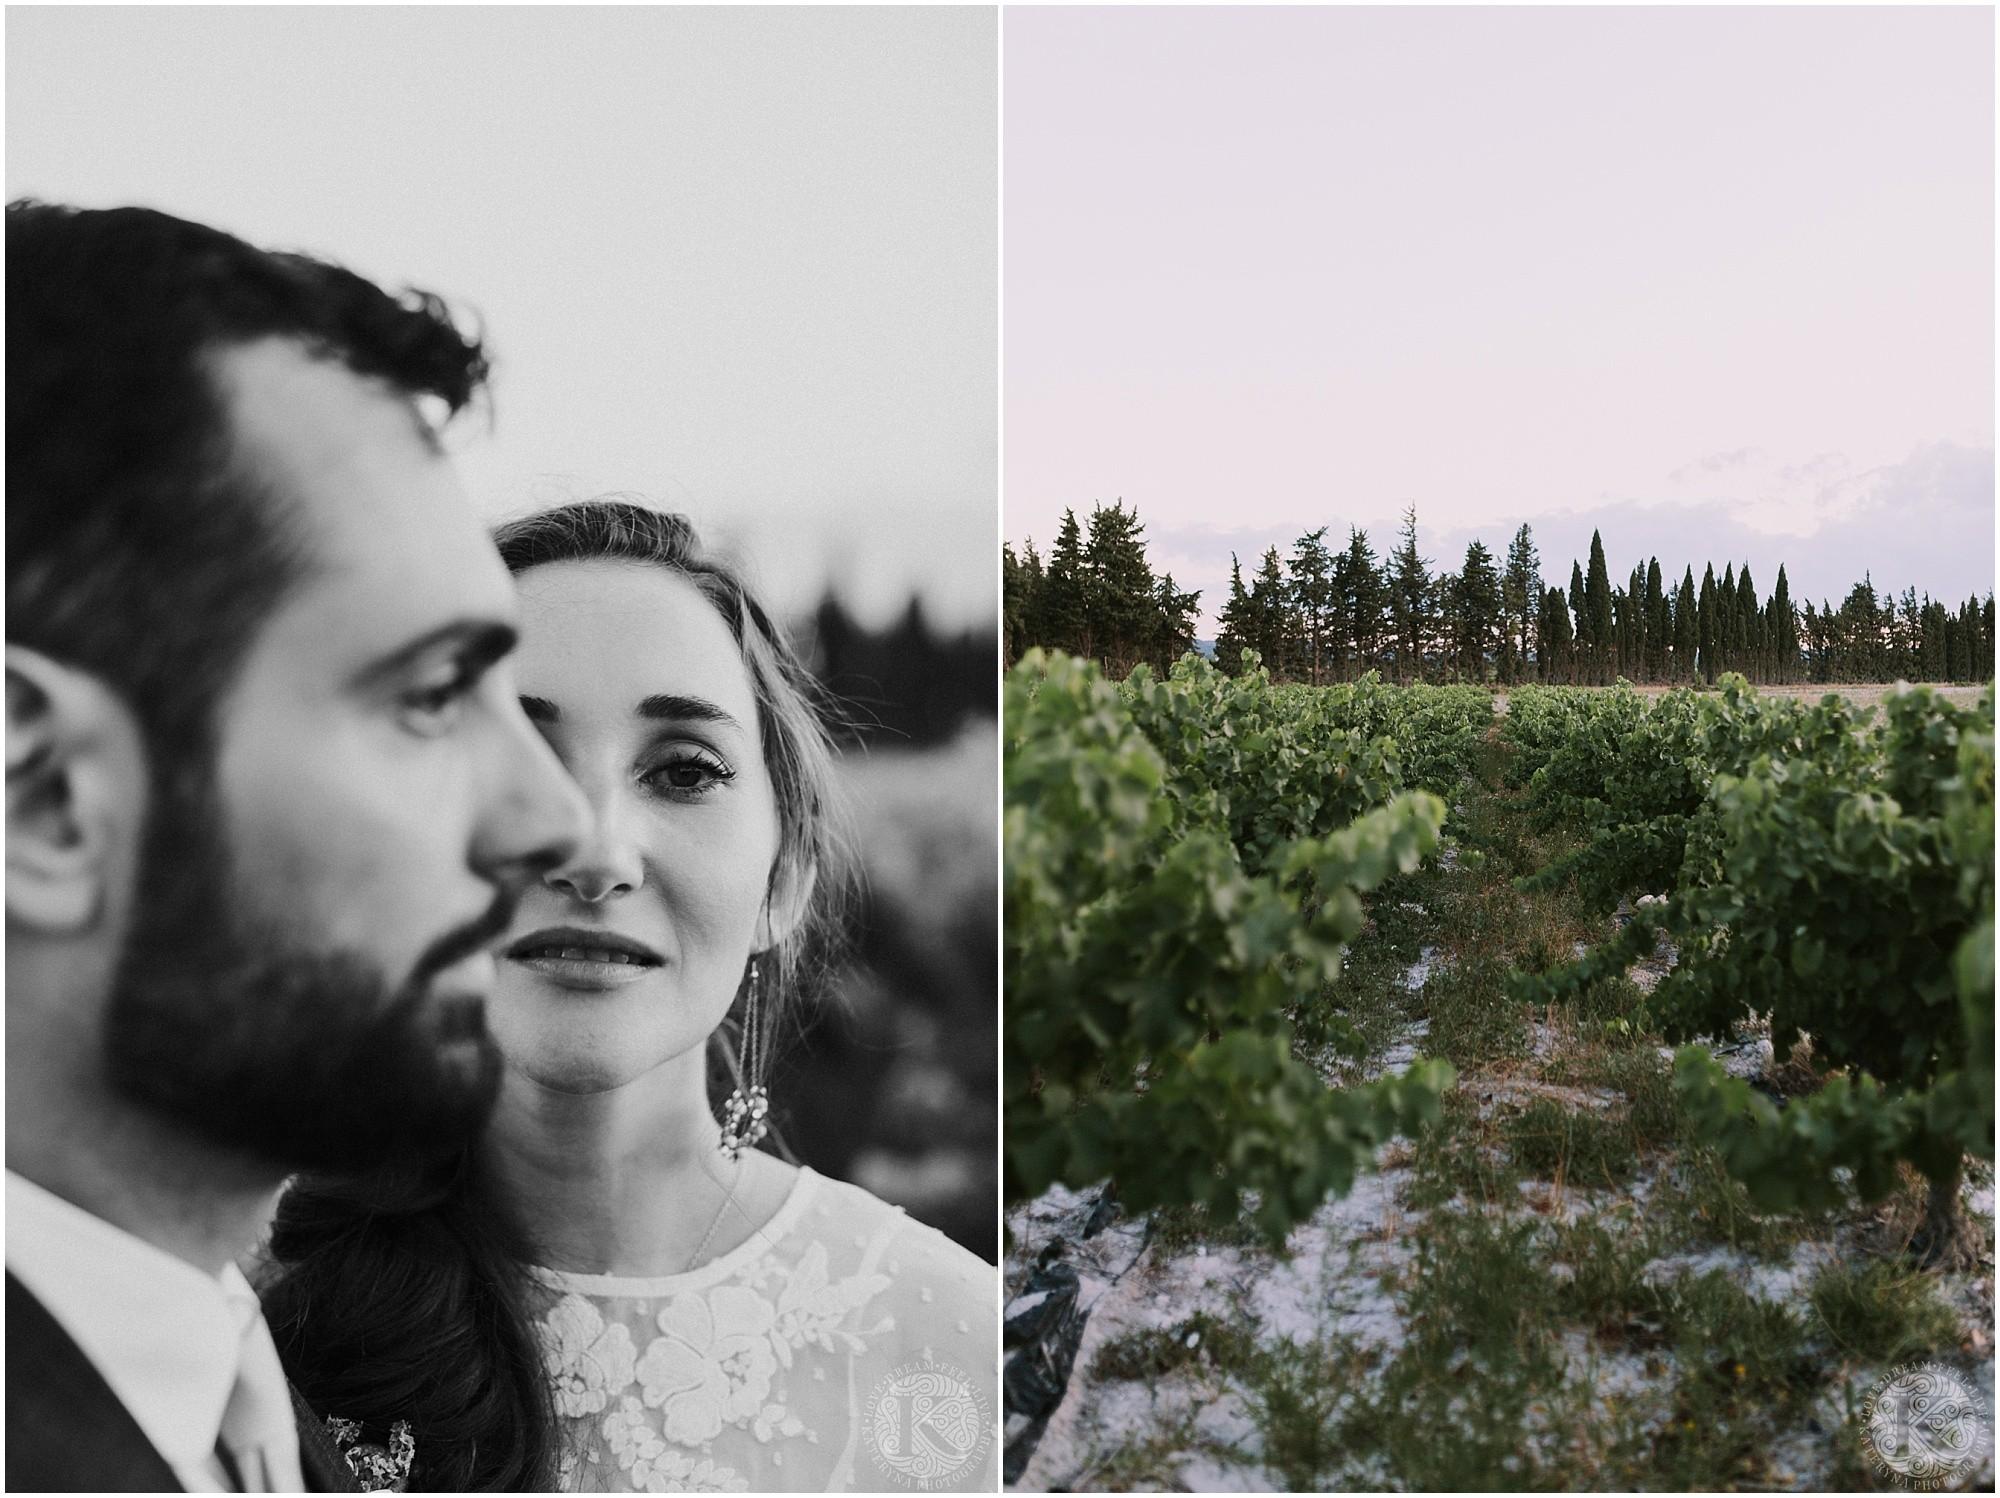 Kateryna-photos-photographe-mariage-vaucluse-provence-avignon-ferme-st-hugues_0085.jpg